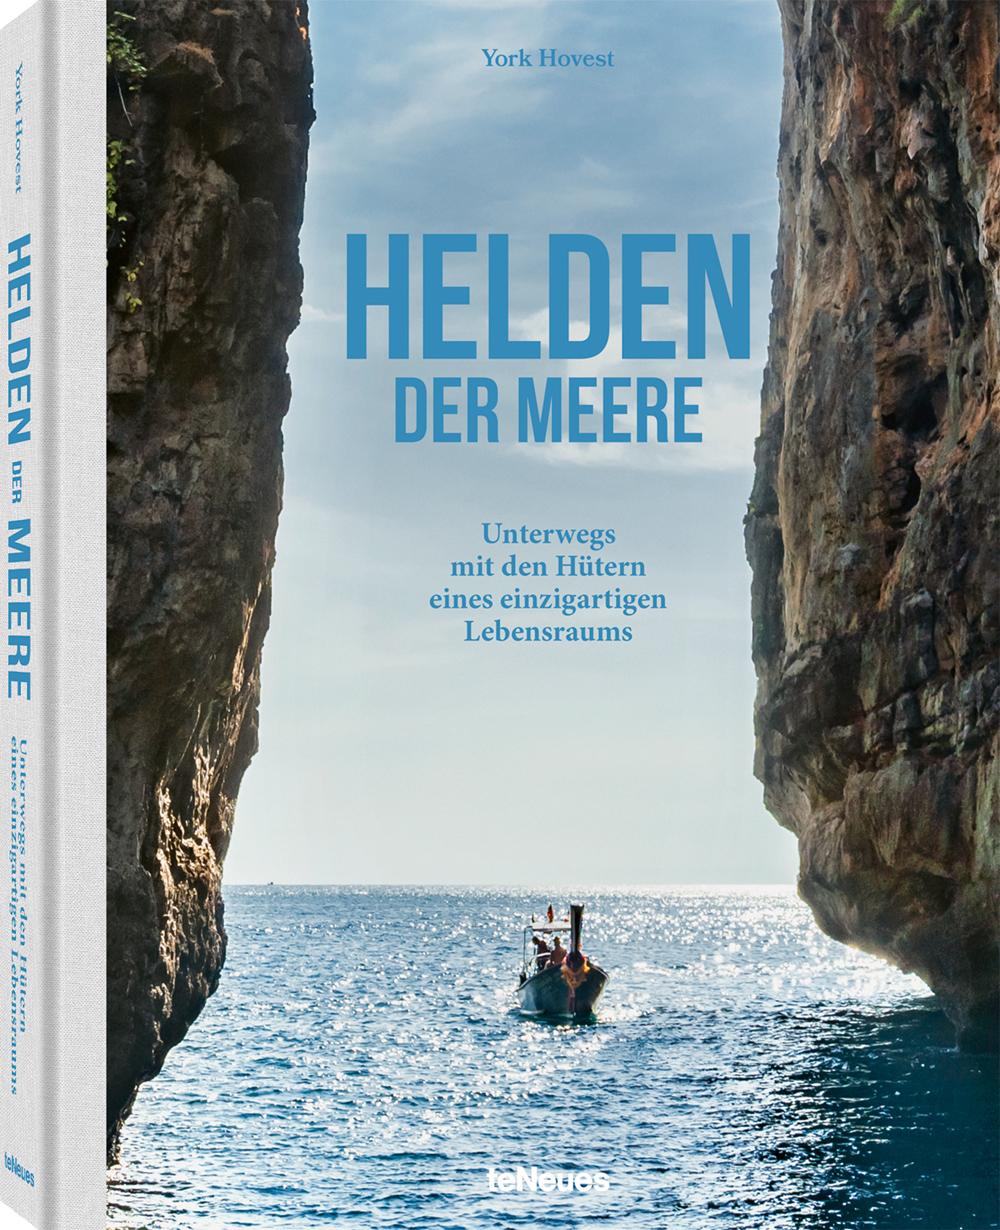 © Helden der Meere von York Hovest, erschienen bei teNeues, € 50,  www.teneues.com , www.heroesofthesea.com , Photo © 2019 York Hovest. Alle Rechte vorbehalten.